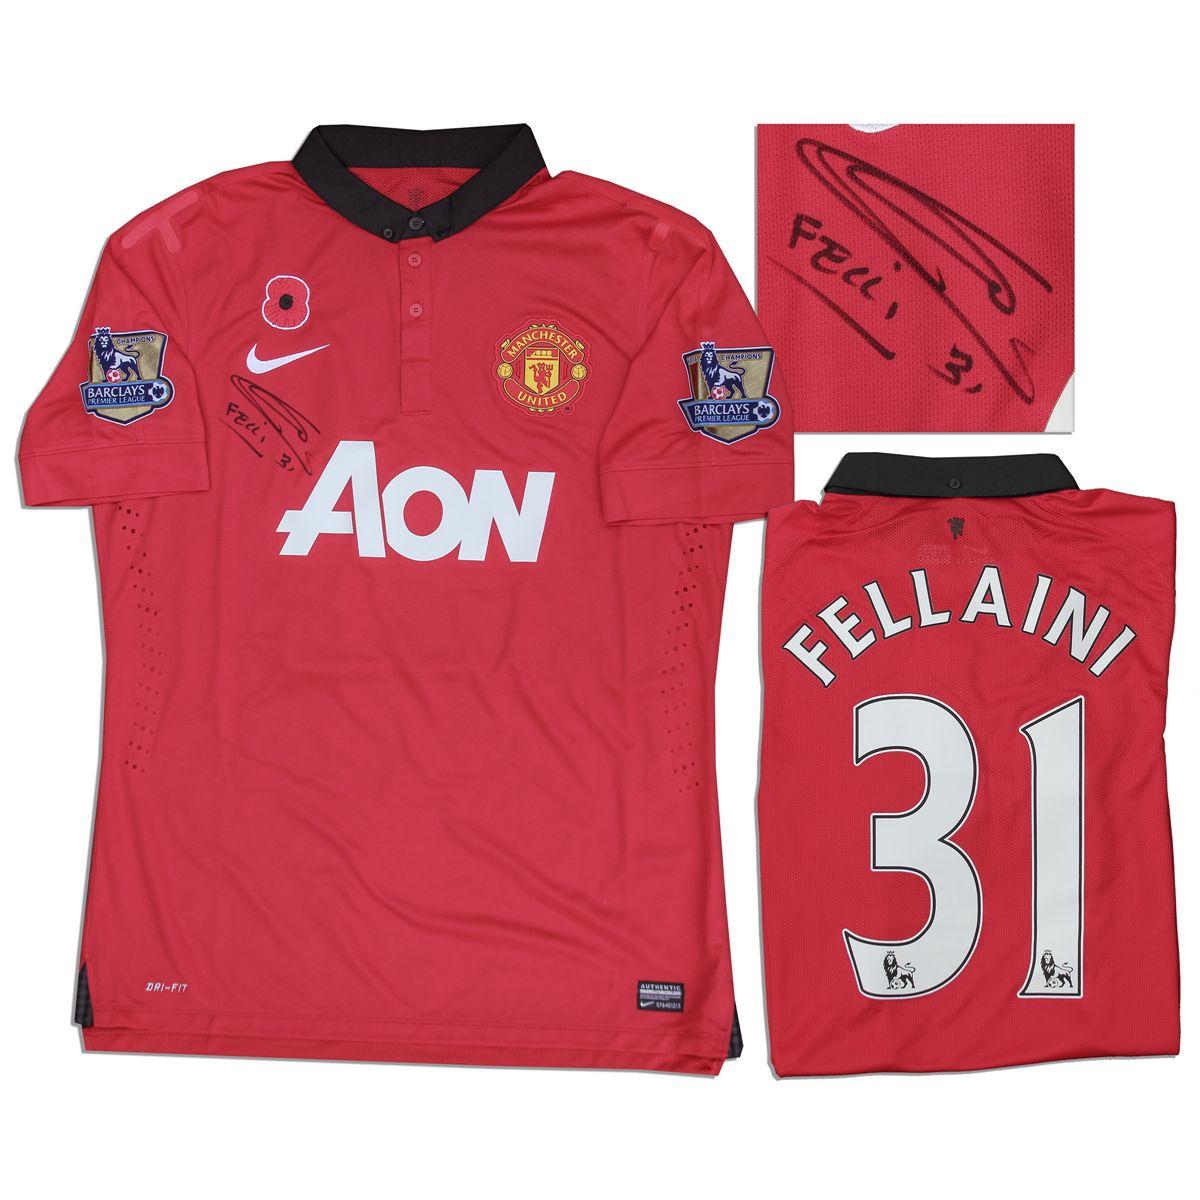 be7f7df3840 Image 1   Marouane Fellaini Match Worn Soccer Jersey Signed